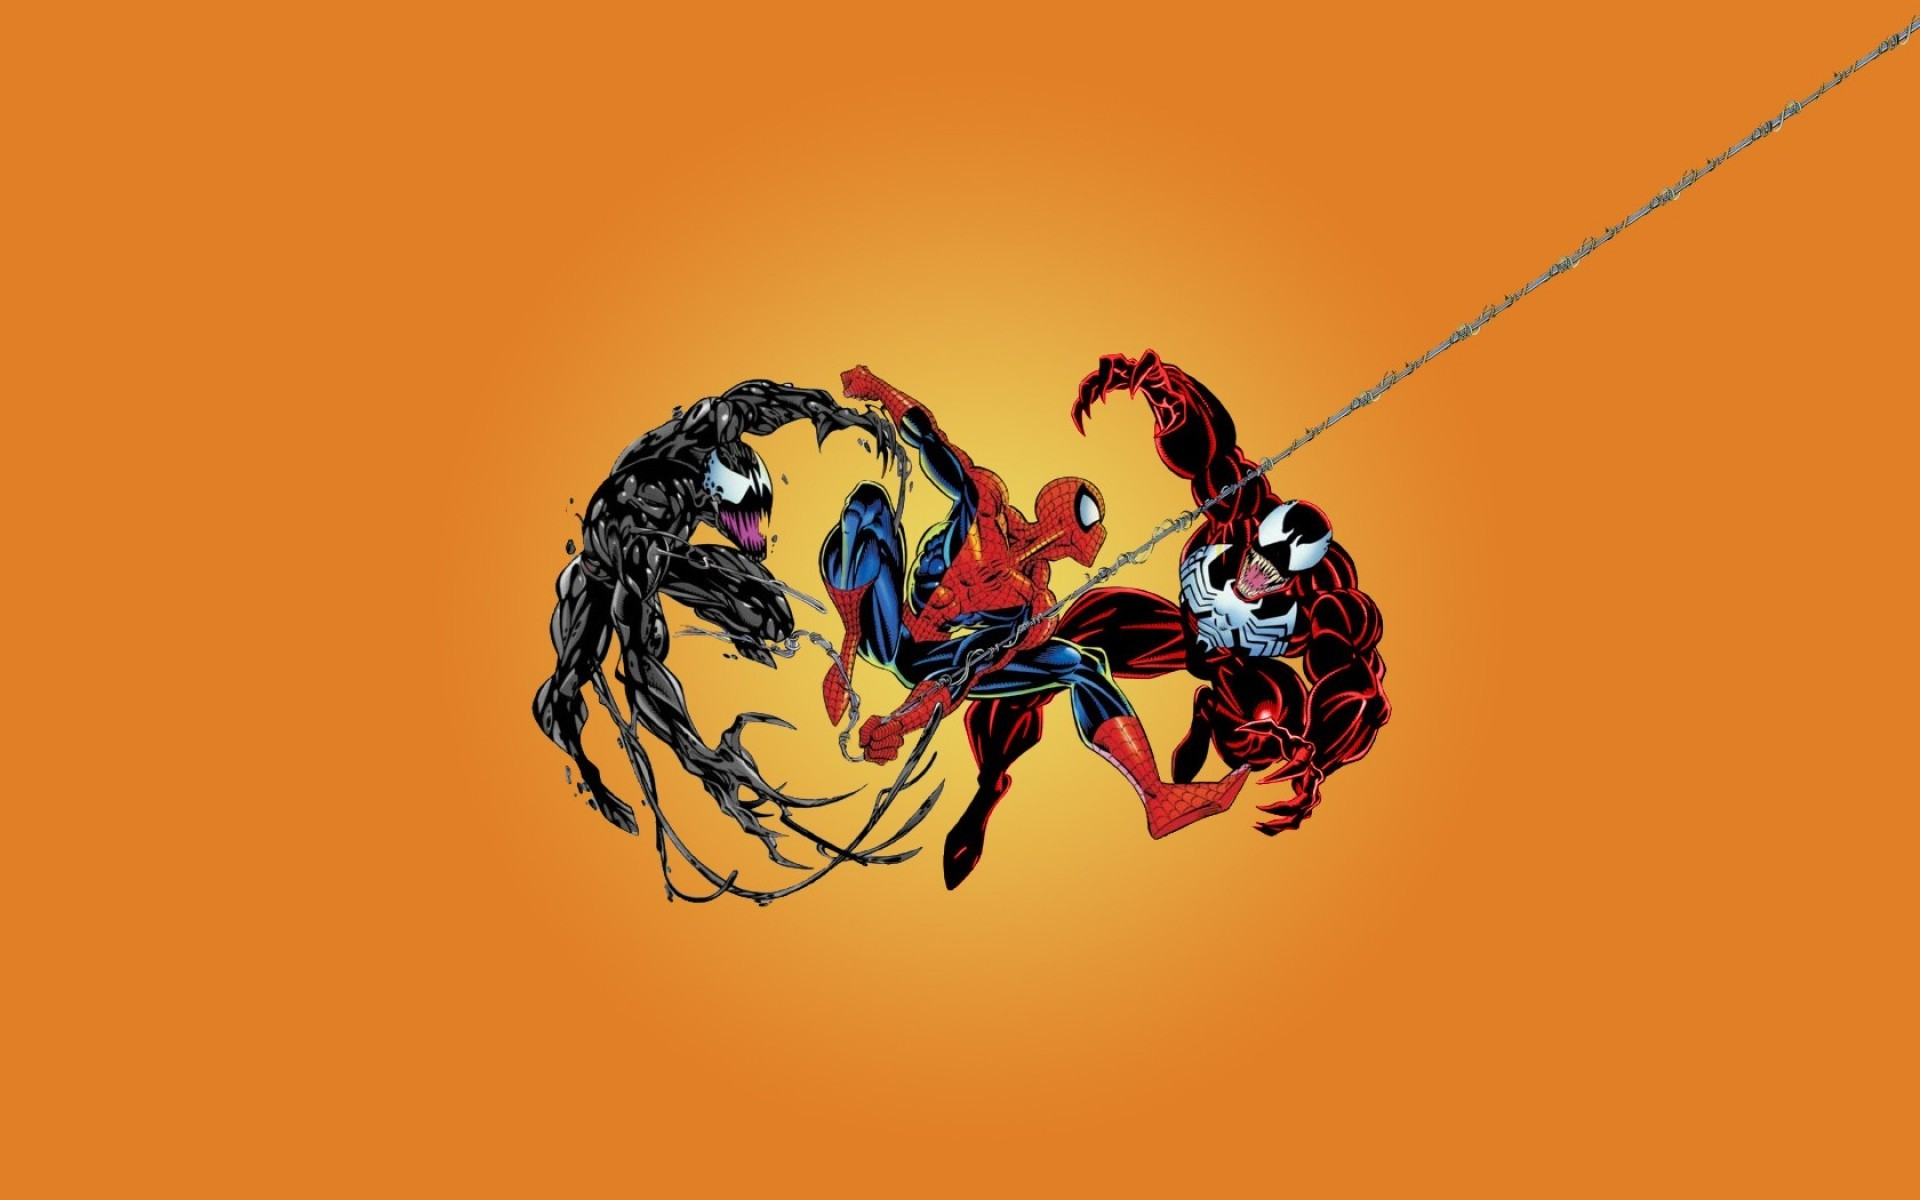 Venom Wallpapers Pictures Images: Marvel Venom Wallpaper HD (67+ Images